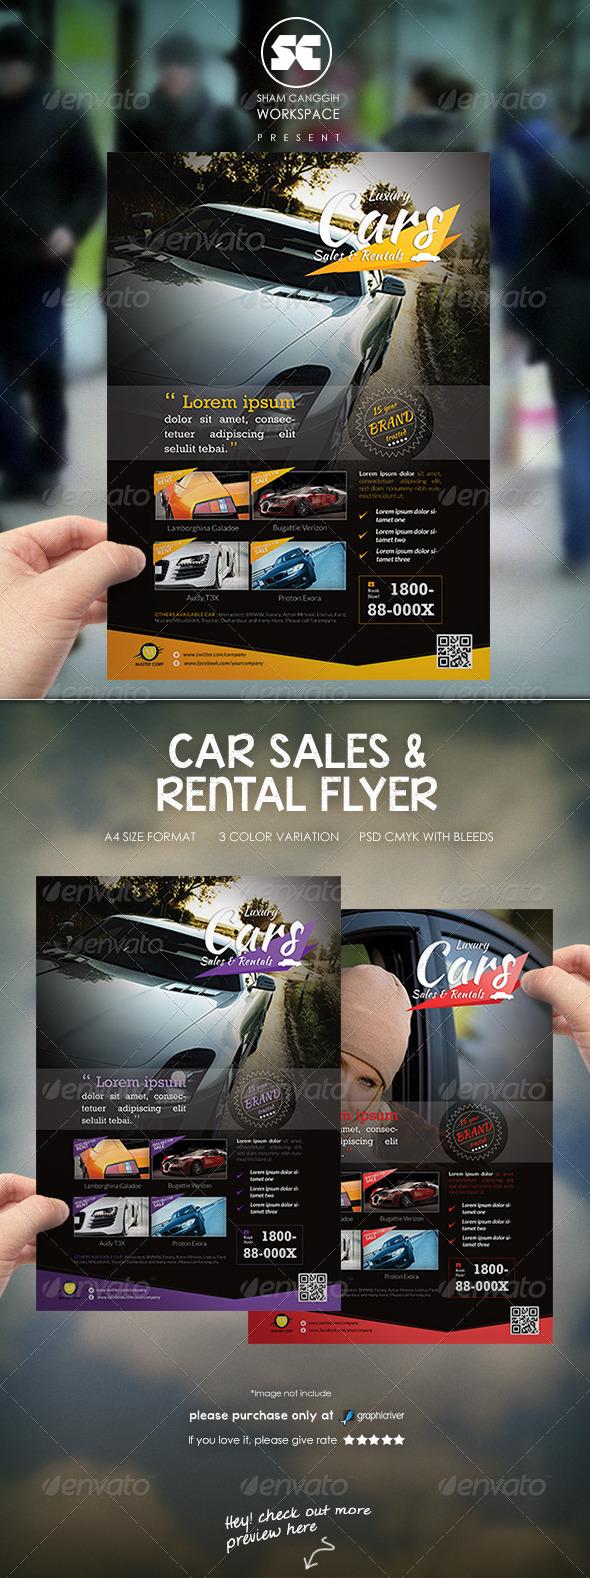 GraphicRiver Car Sales Rental Flyer Magazine Ads 6856106